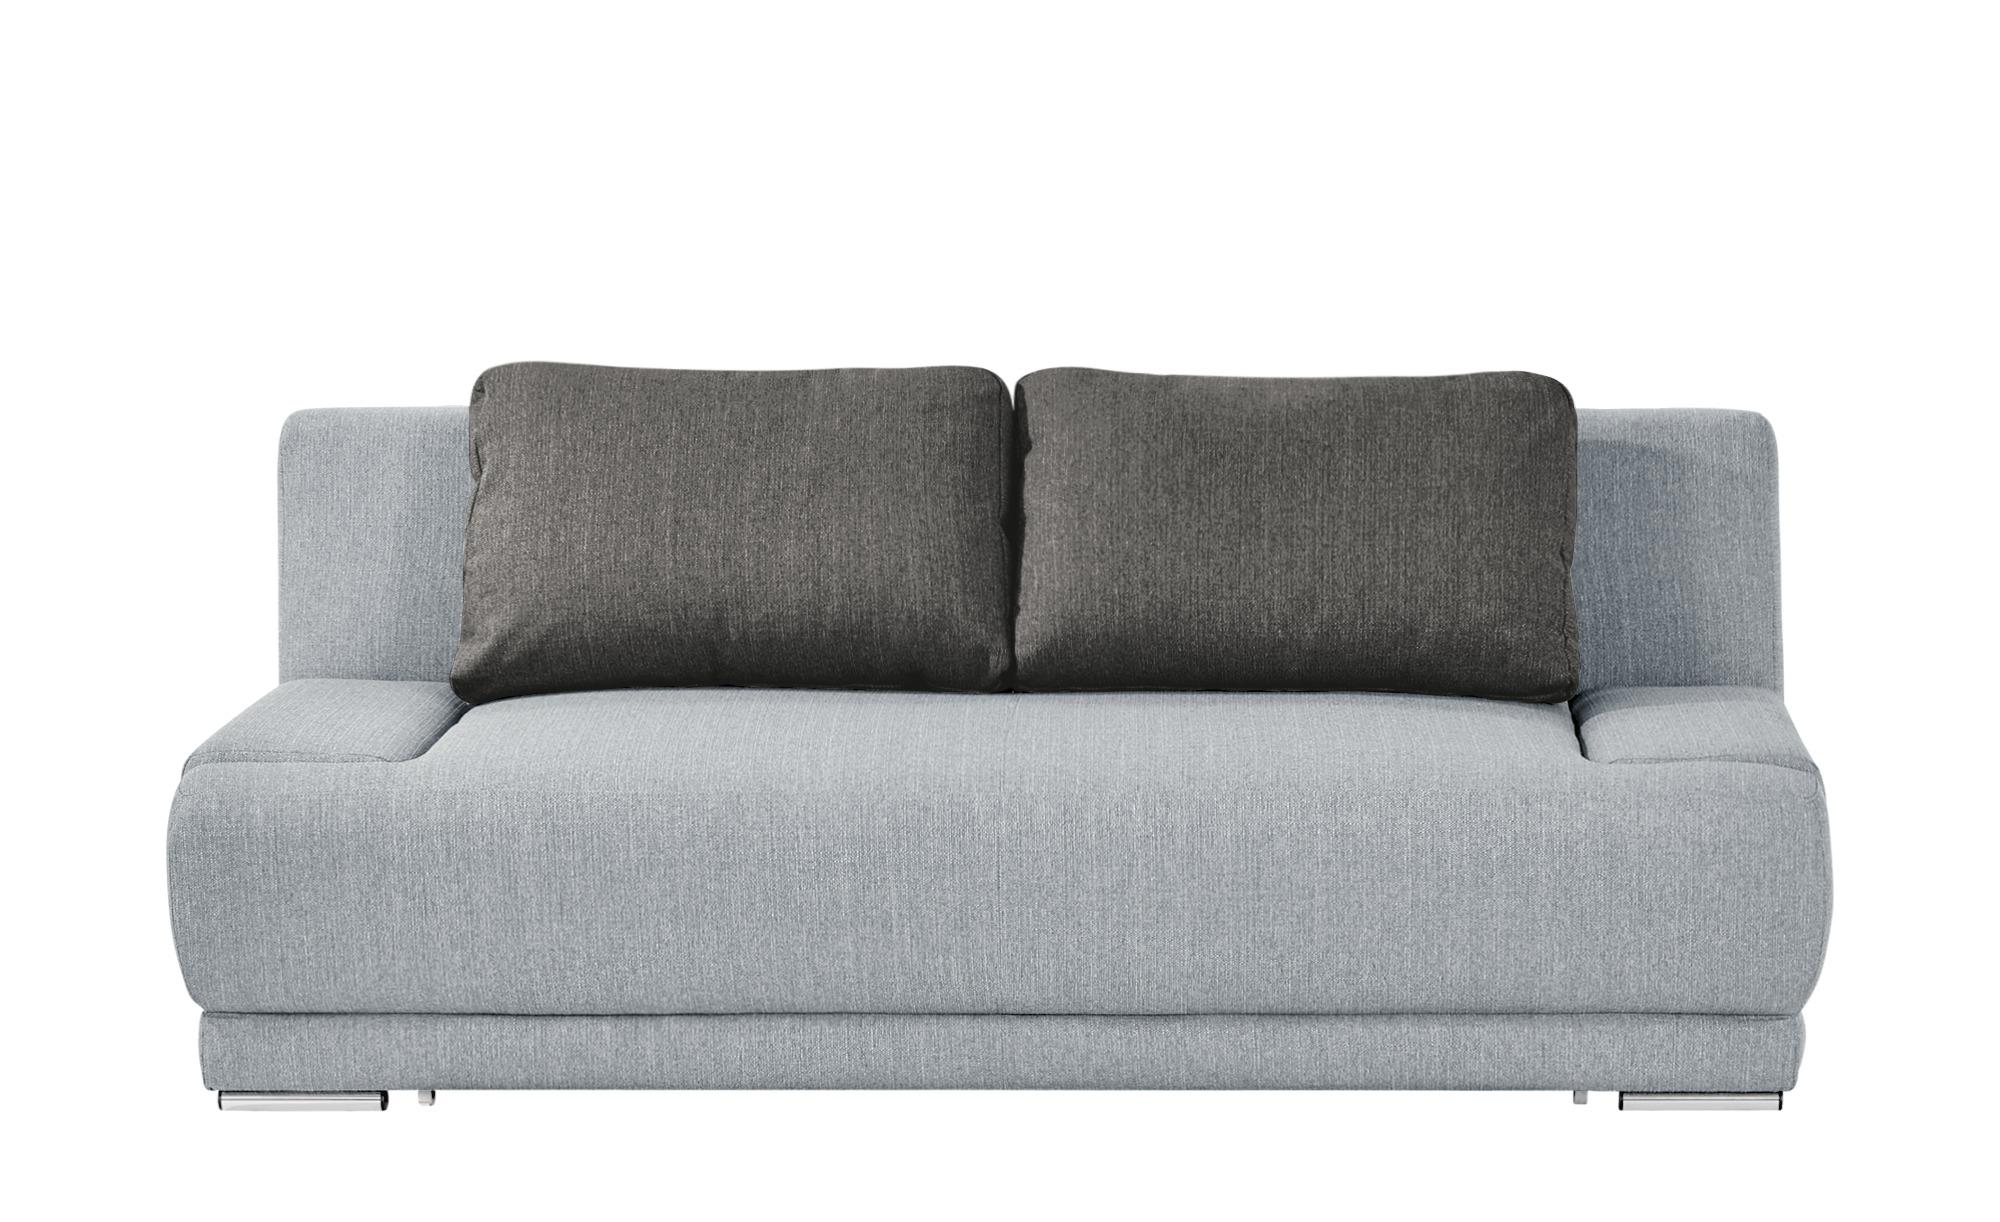 smart Schlafsofa grau/dunkelgrau - Flachgewebe Regina ¦ grau ¦ Maße (cm): B: 206 H: 83 T: 98 Polstermöbel > Sofas > 2-Sitzer - Höffner